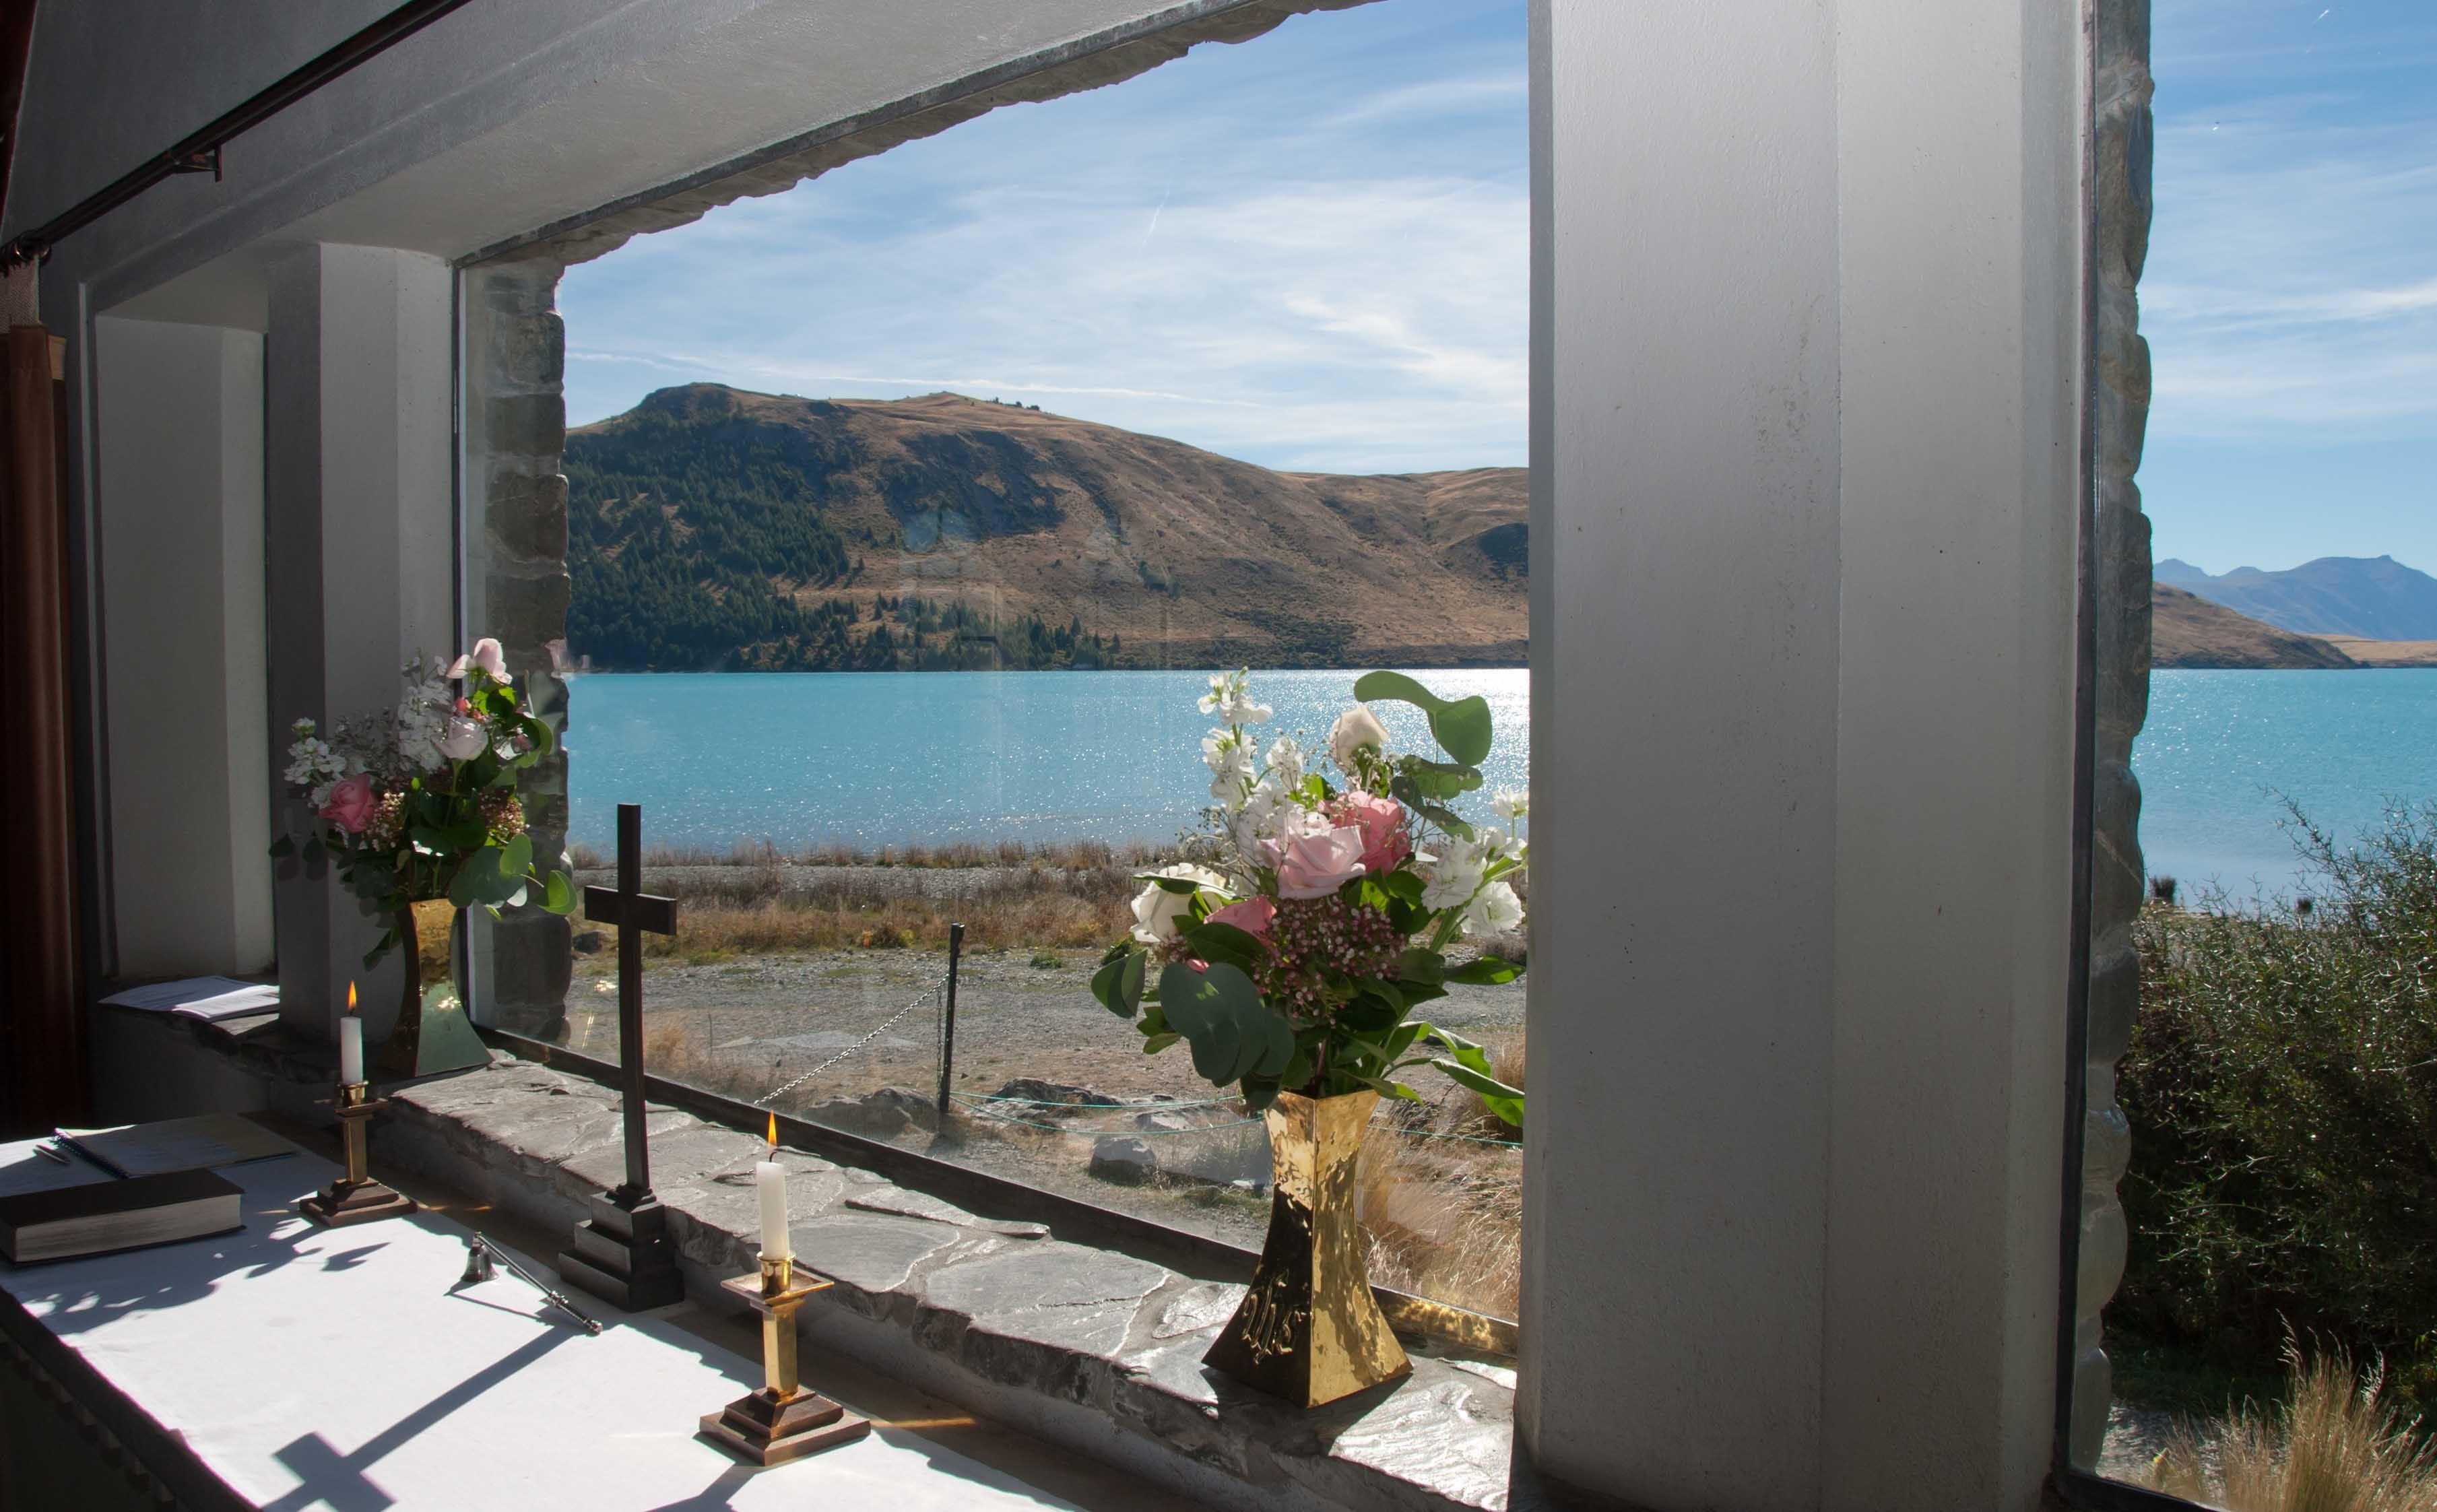 The stunning view you get inside the Church of the Good Shepherd at Lake Tekapo.